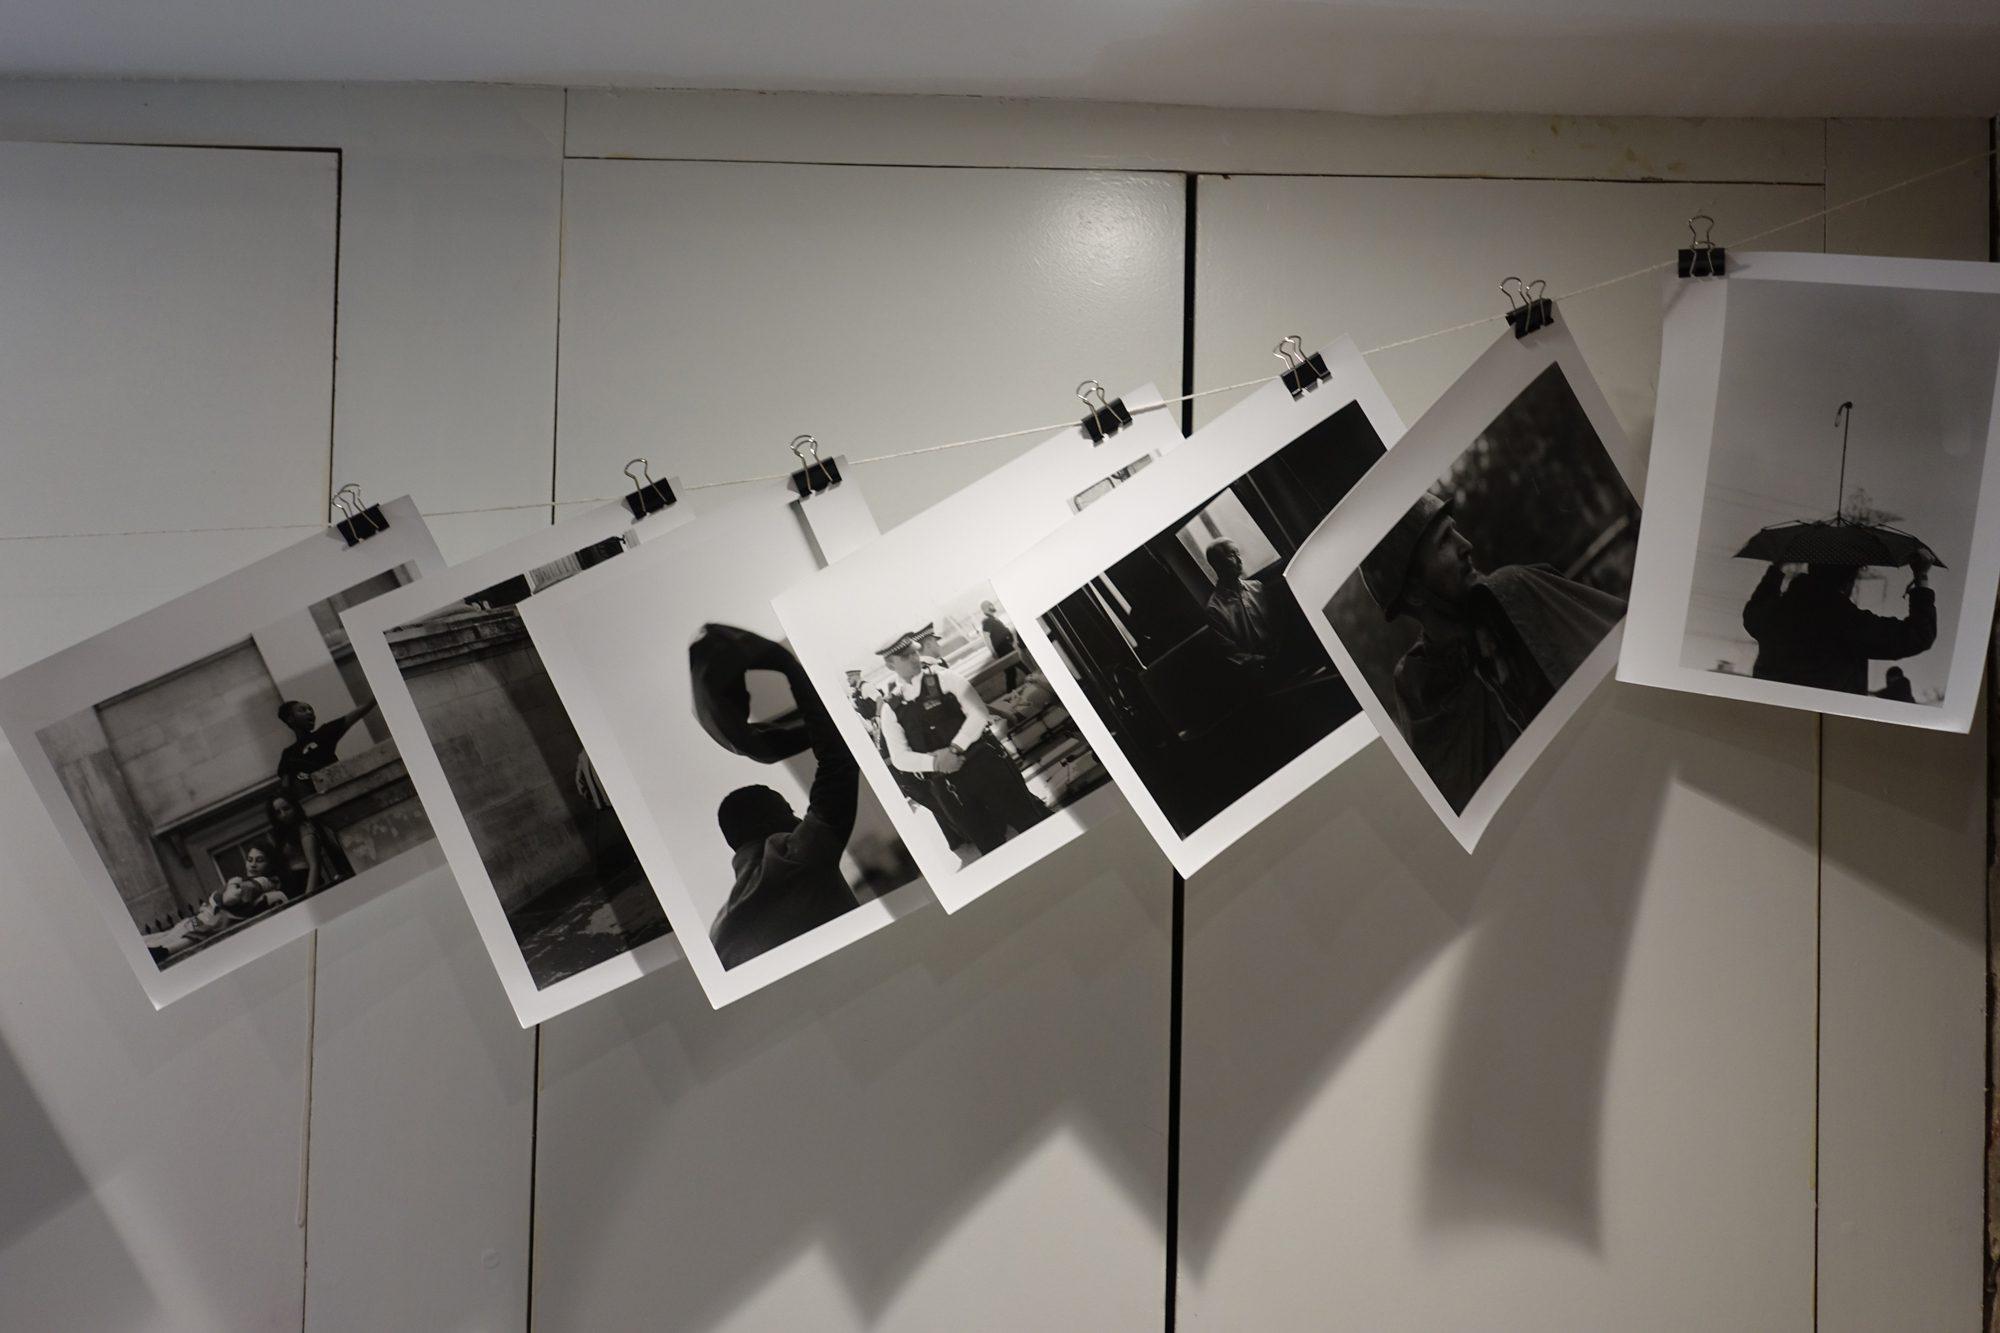 Darkroom print on ILFORD MULTIGRADE Satin paper by Simon King for magazine post on LFORDPHOTO.COM